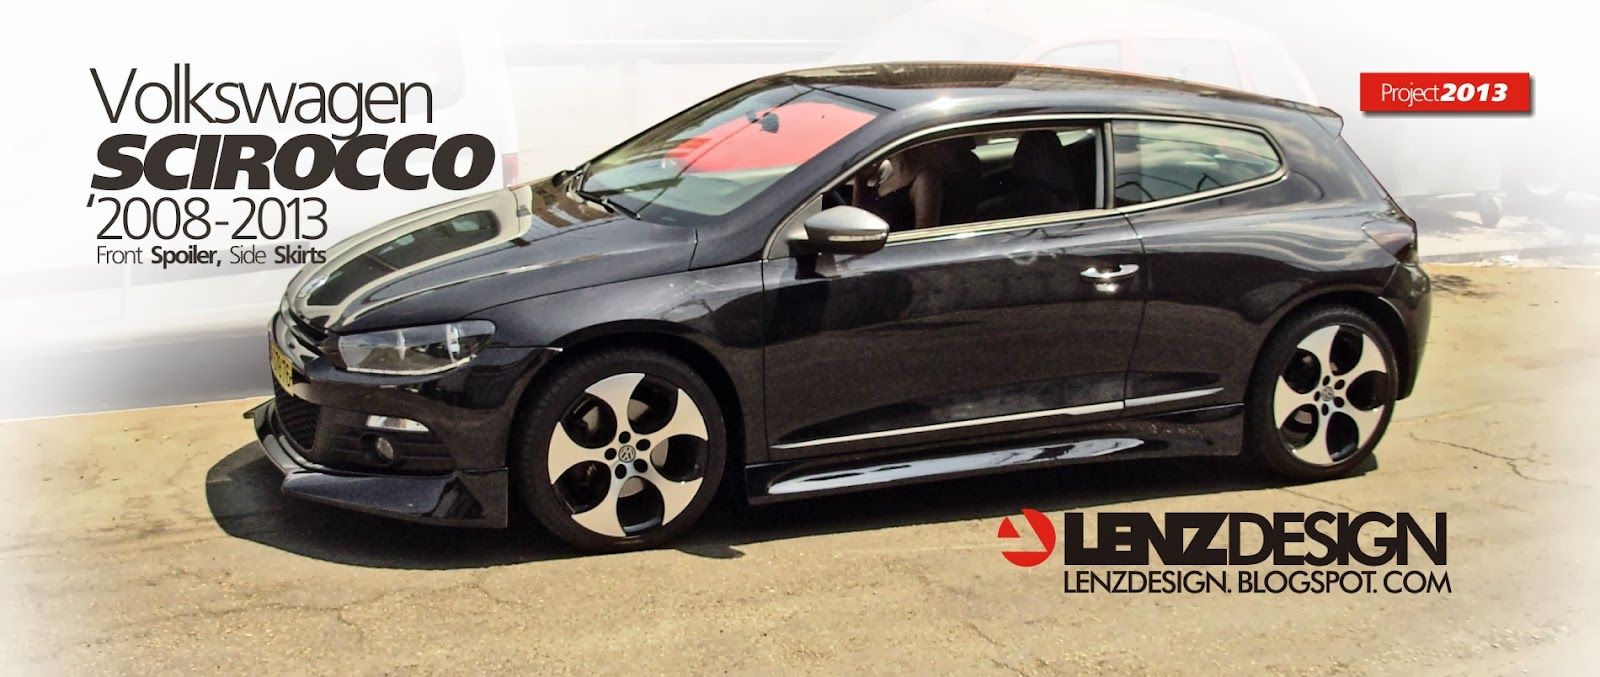 Mazda 3 Hatchback 2017 >> VW Scirocco Tuning - Body Kit Lenzdesign Performance